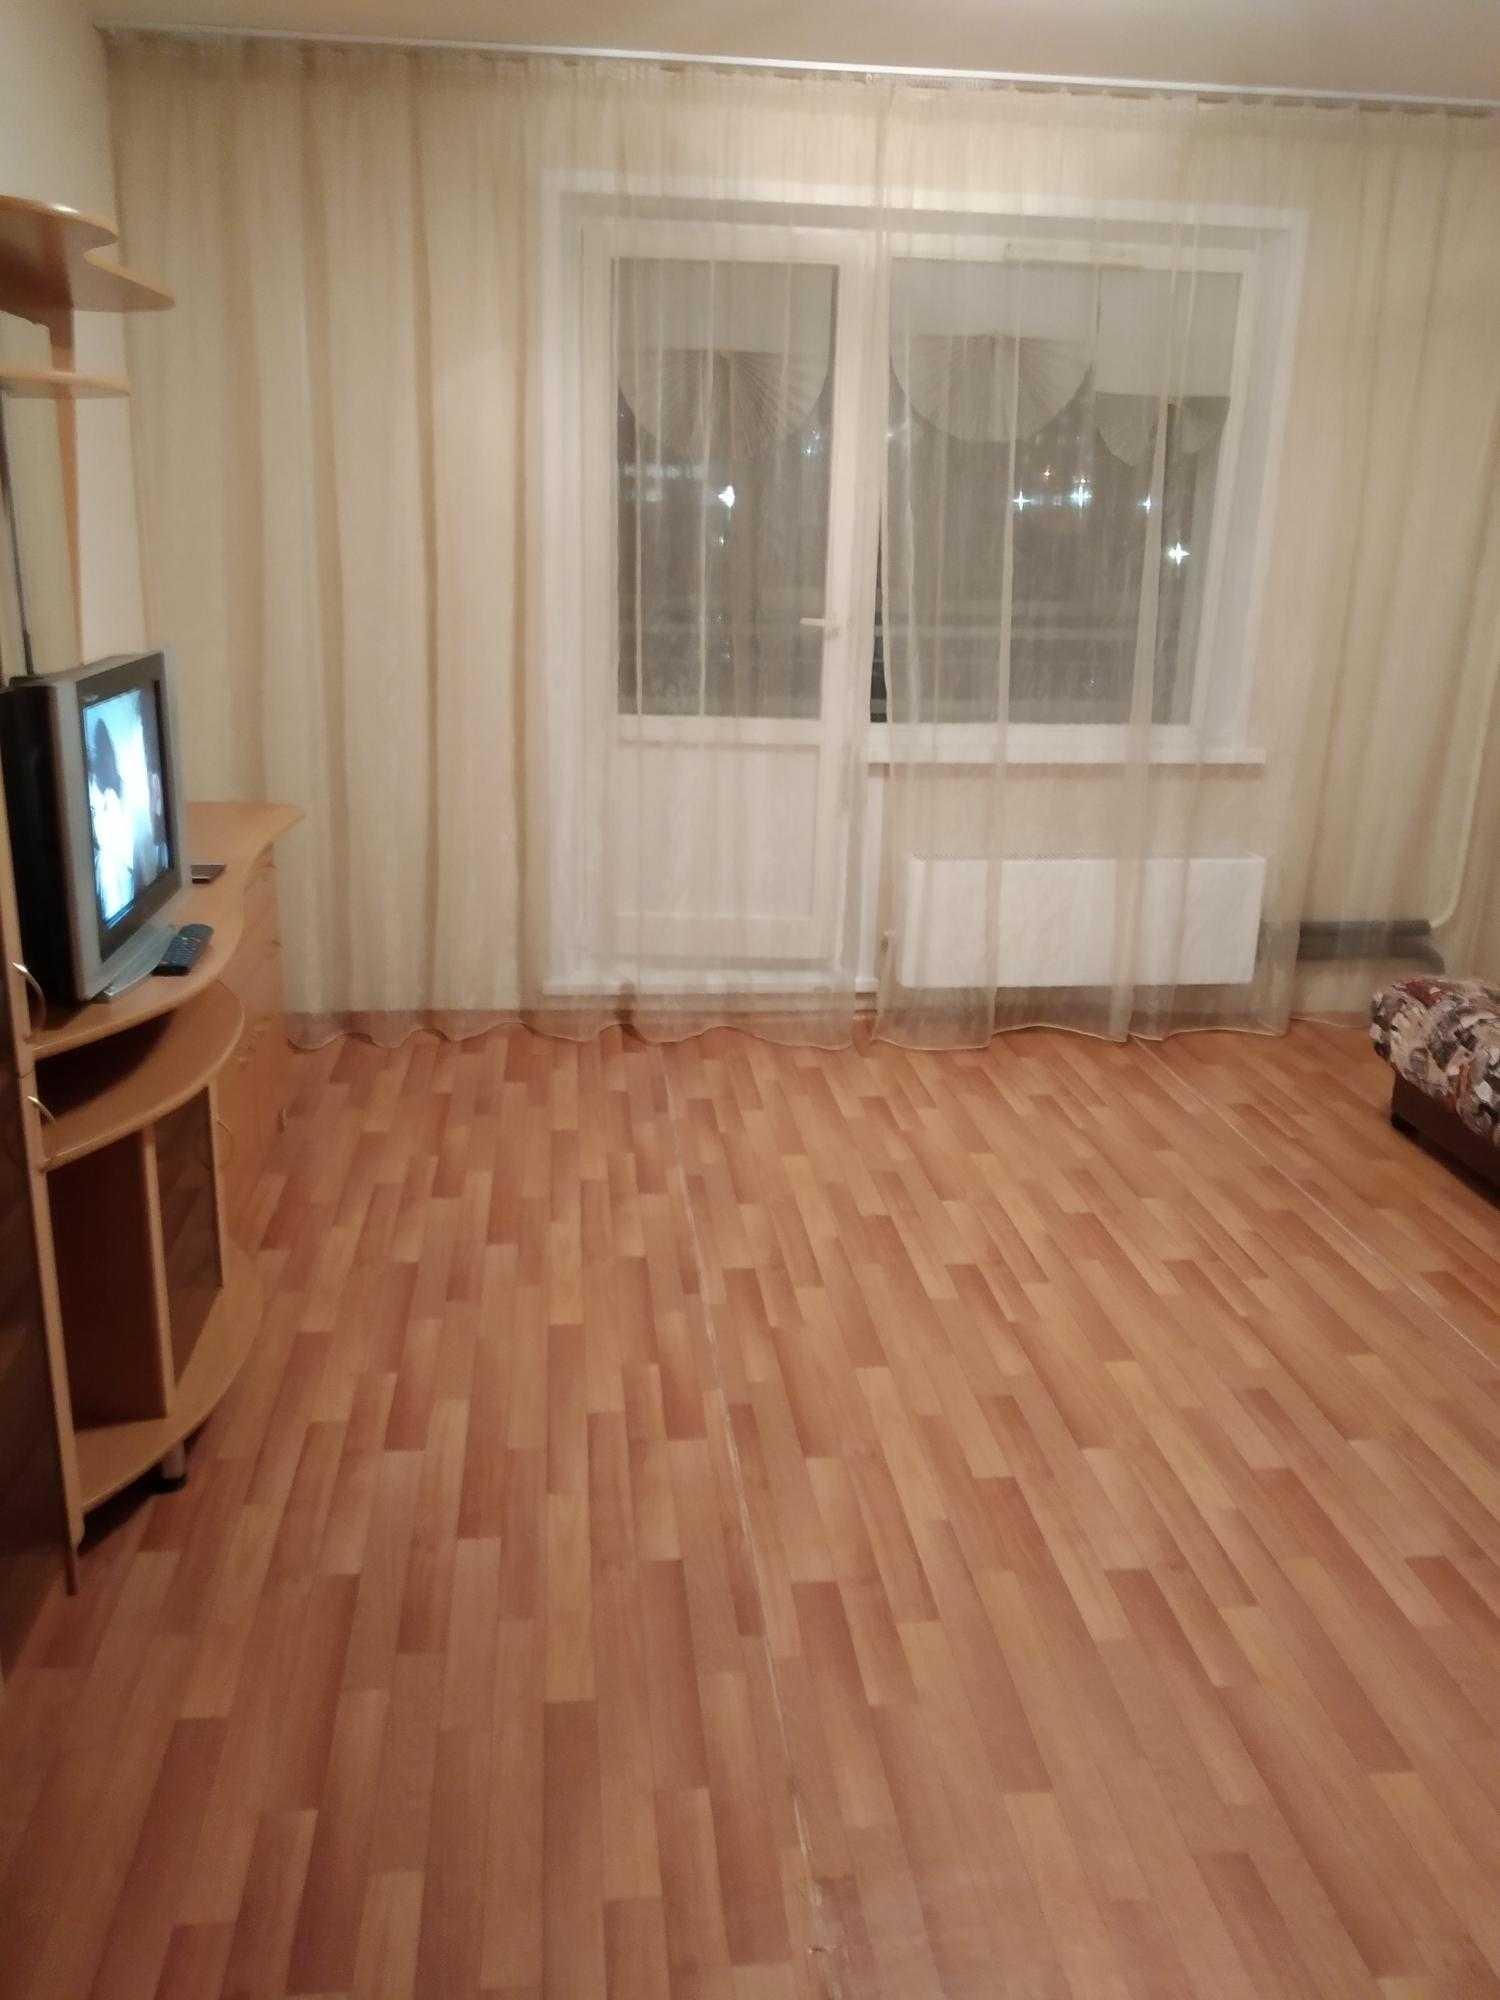 1к квартира улица Судостроительная, 145 | 15000 | аренда в Красноярске фото 0